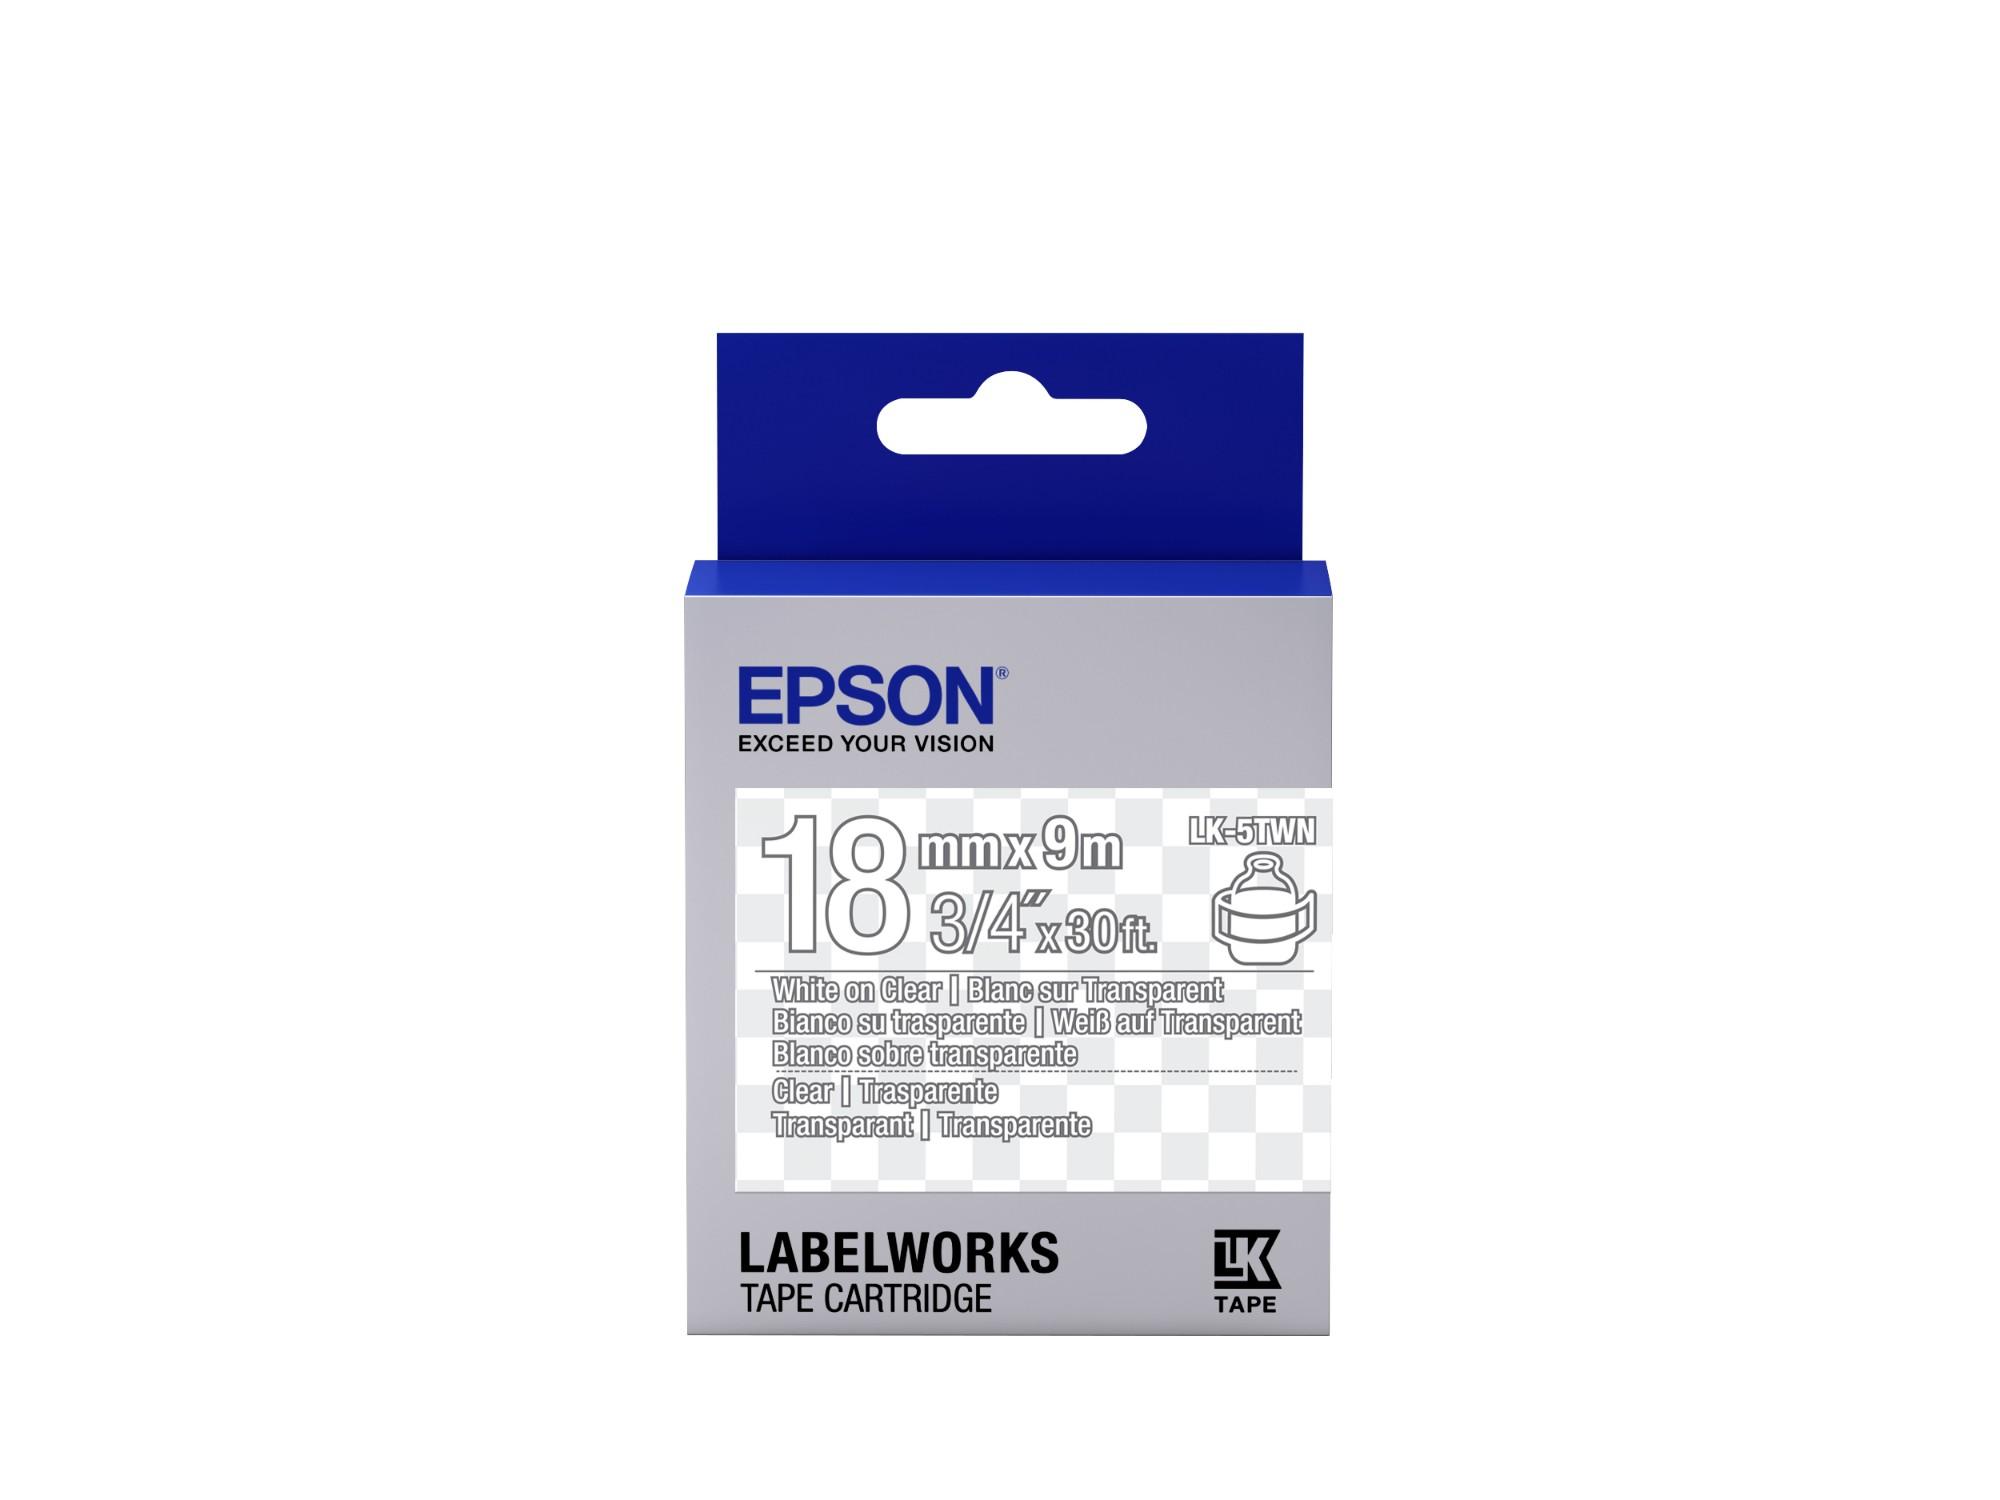 Epson Transparent Tape - LK-5TWN Clear White/Clear 18/9